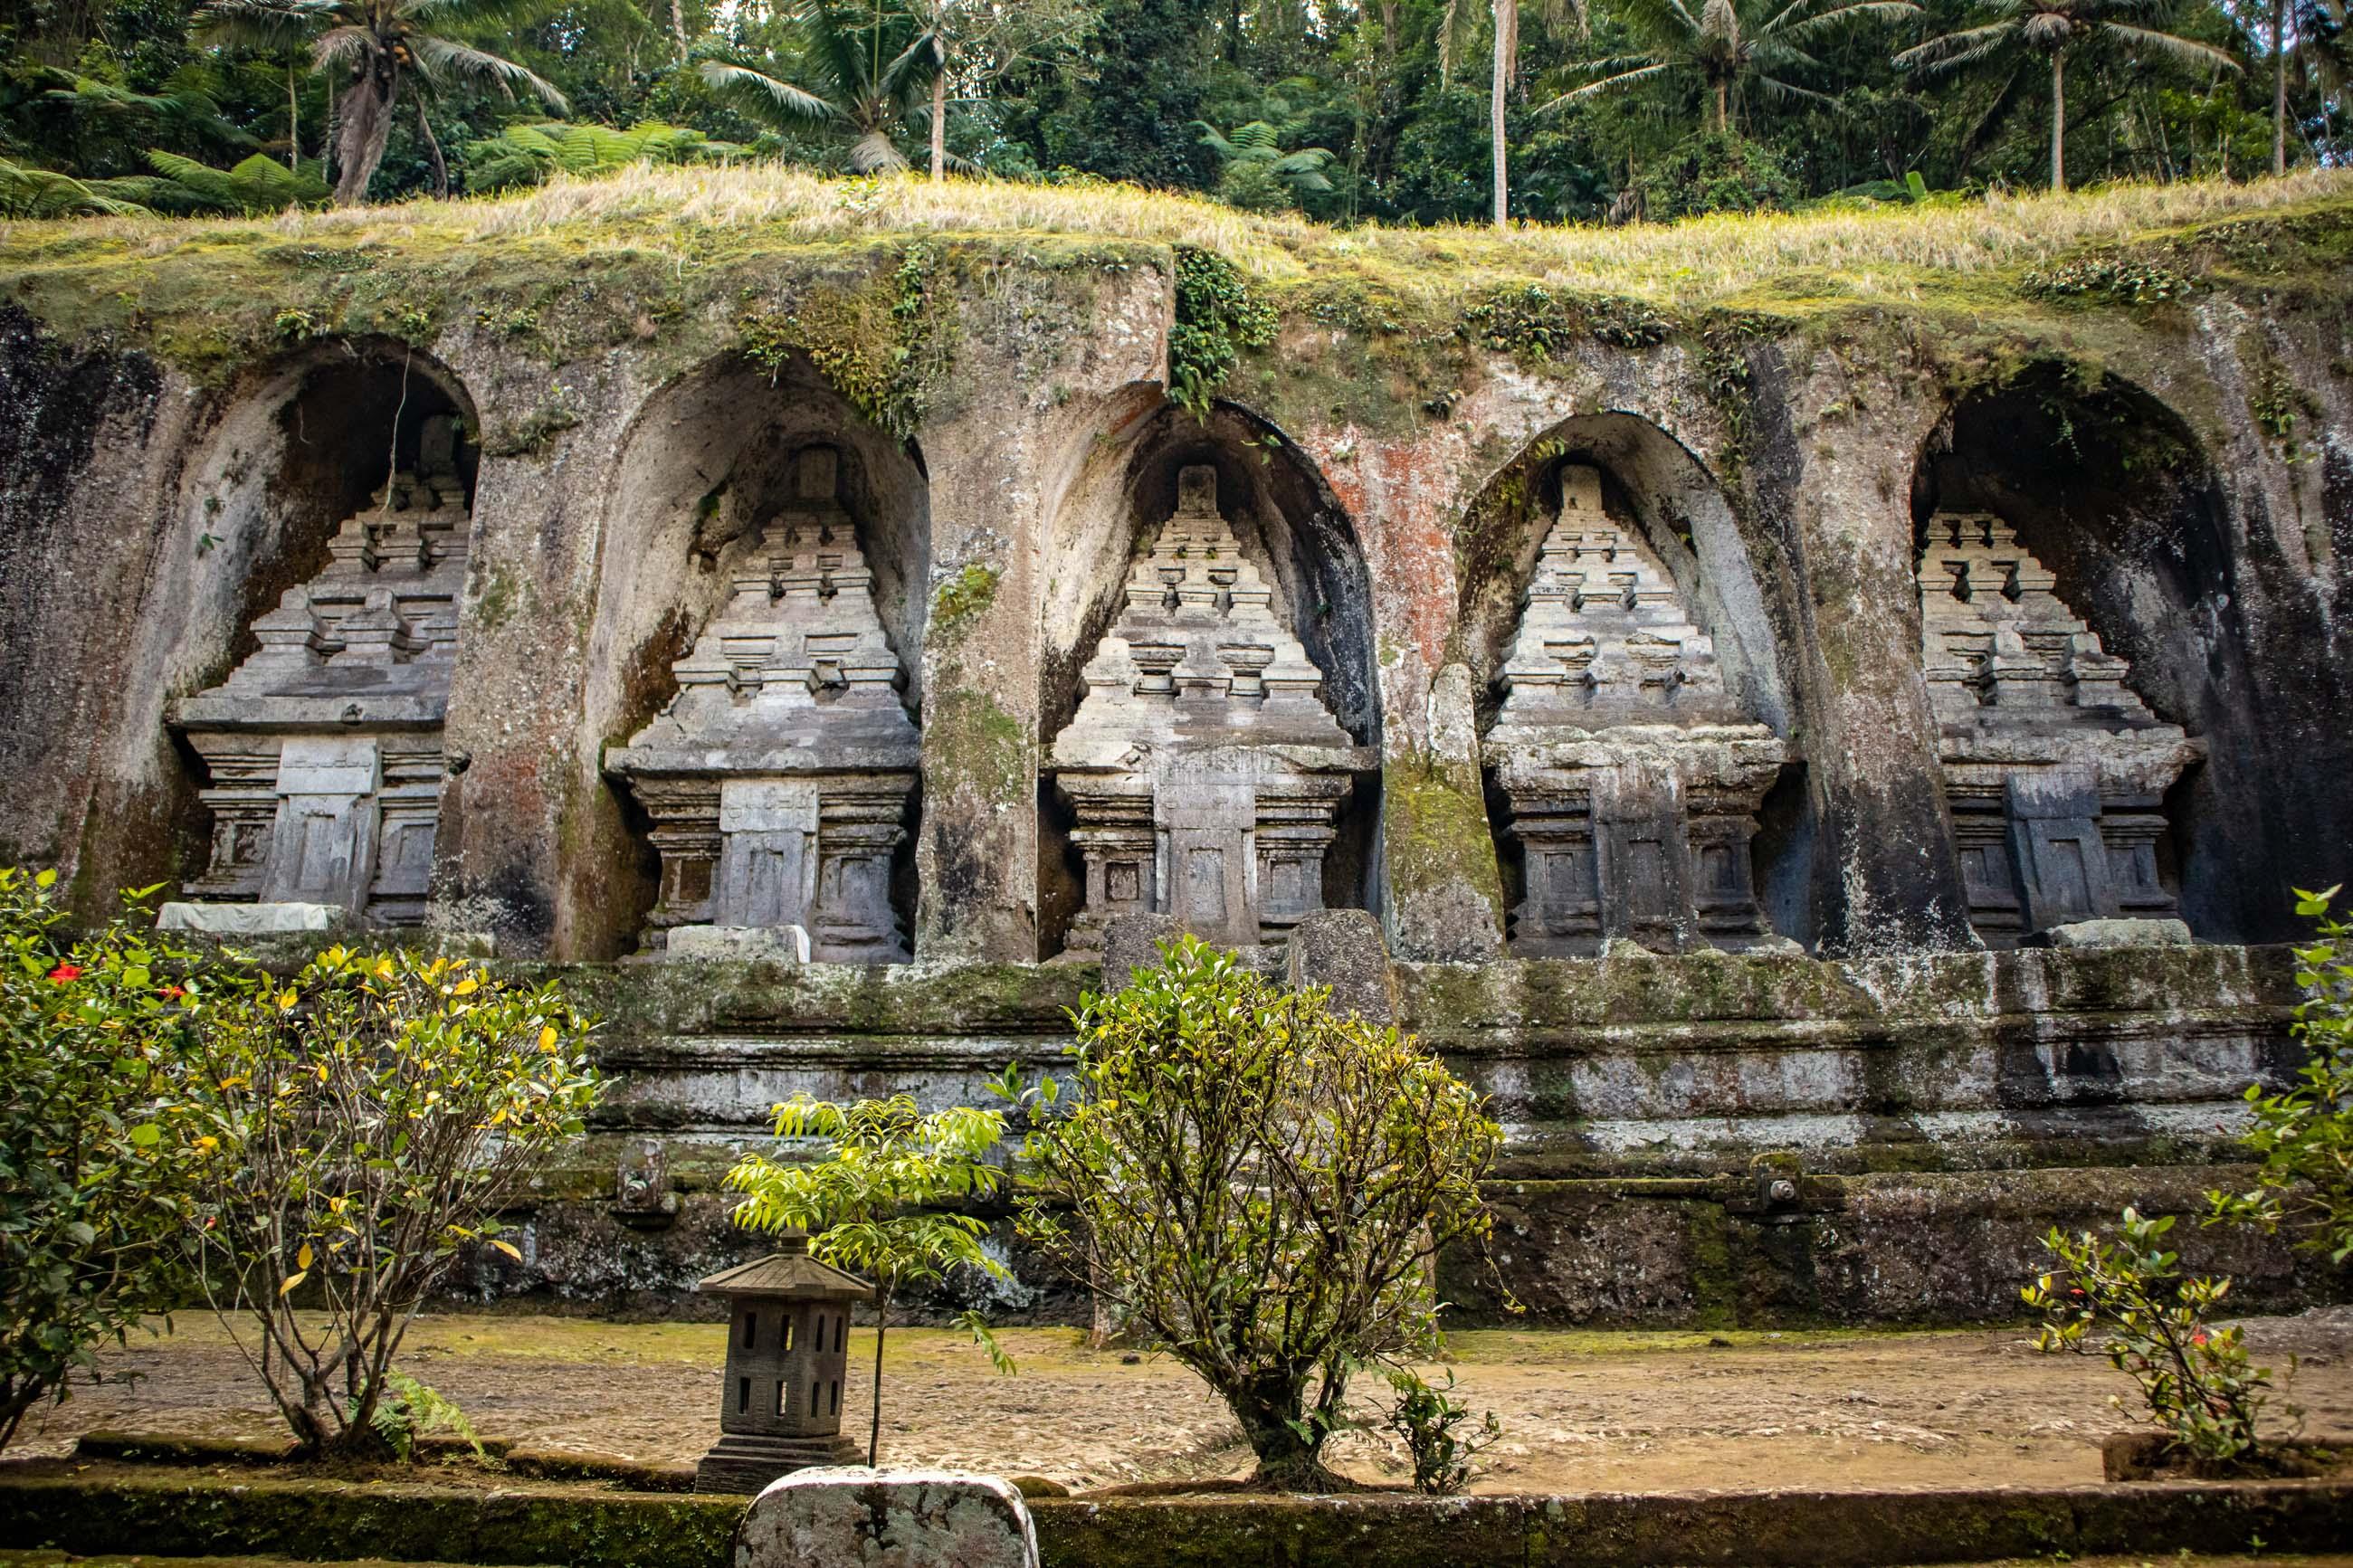 https://bubo.sk/uploads/galleries/7304/tomashornak_indonezia_bali_img_0453-1-79.jpg